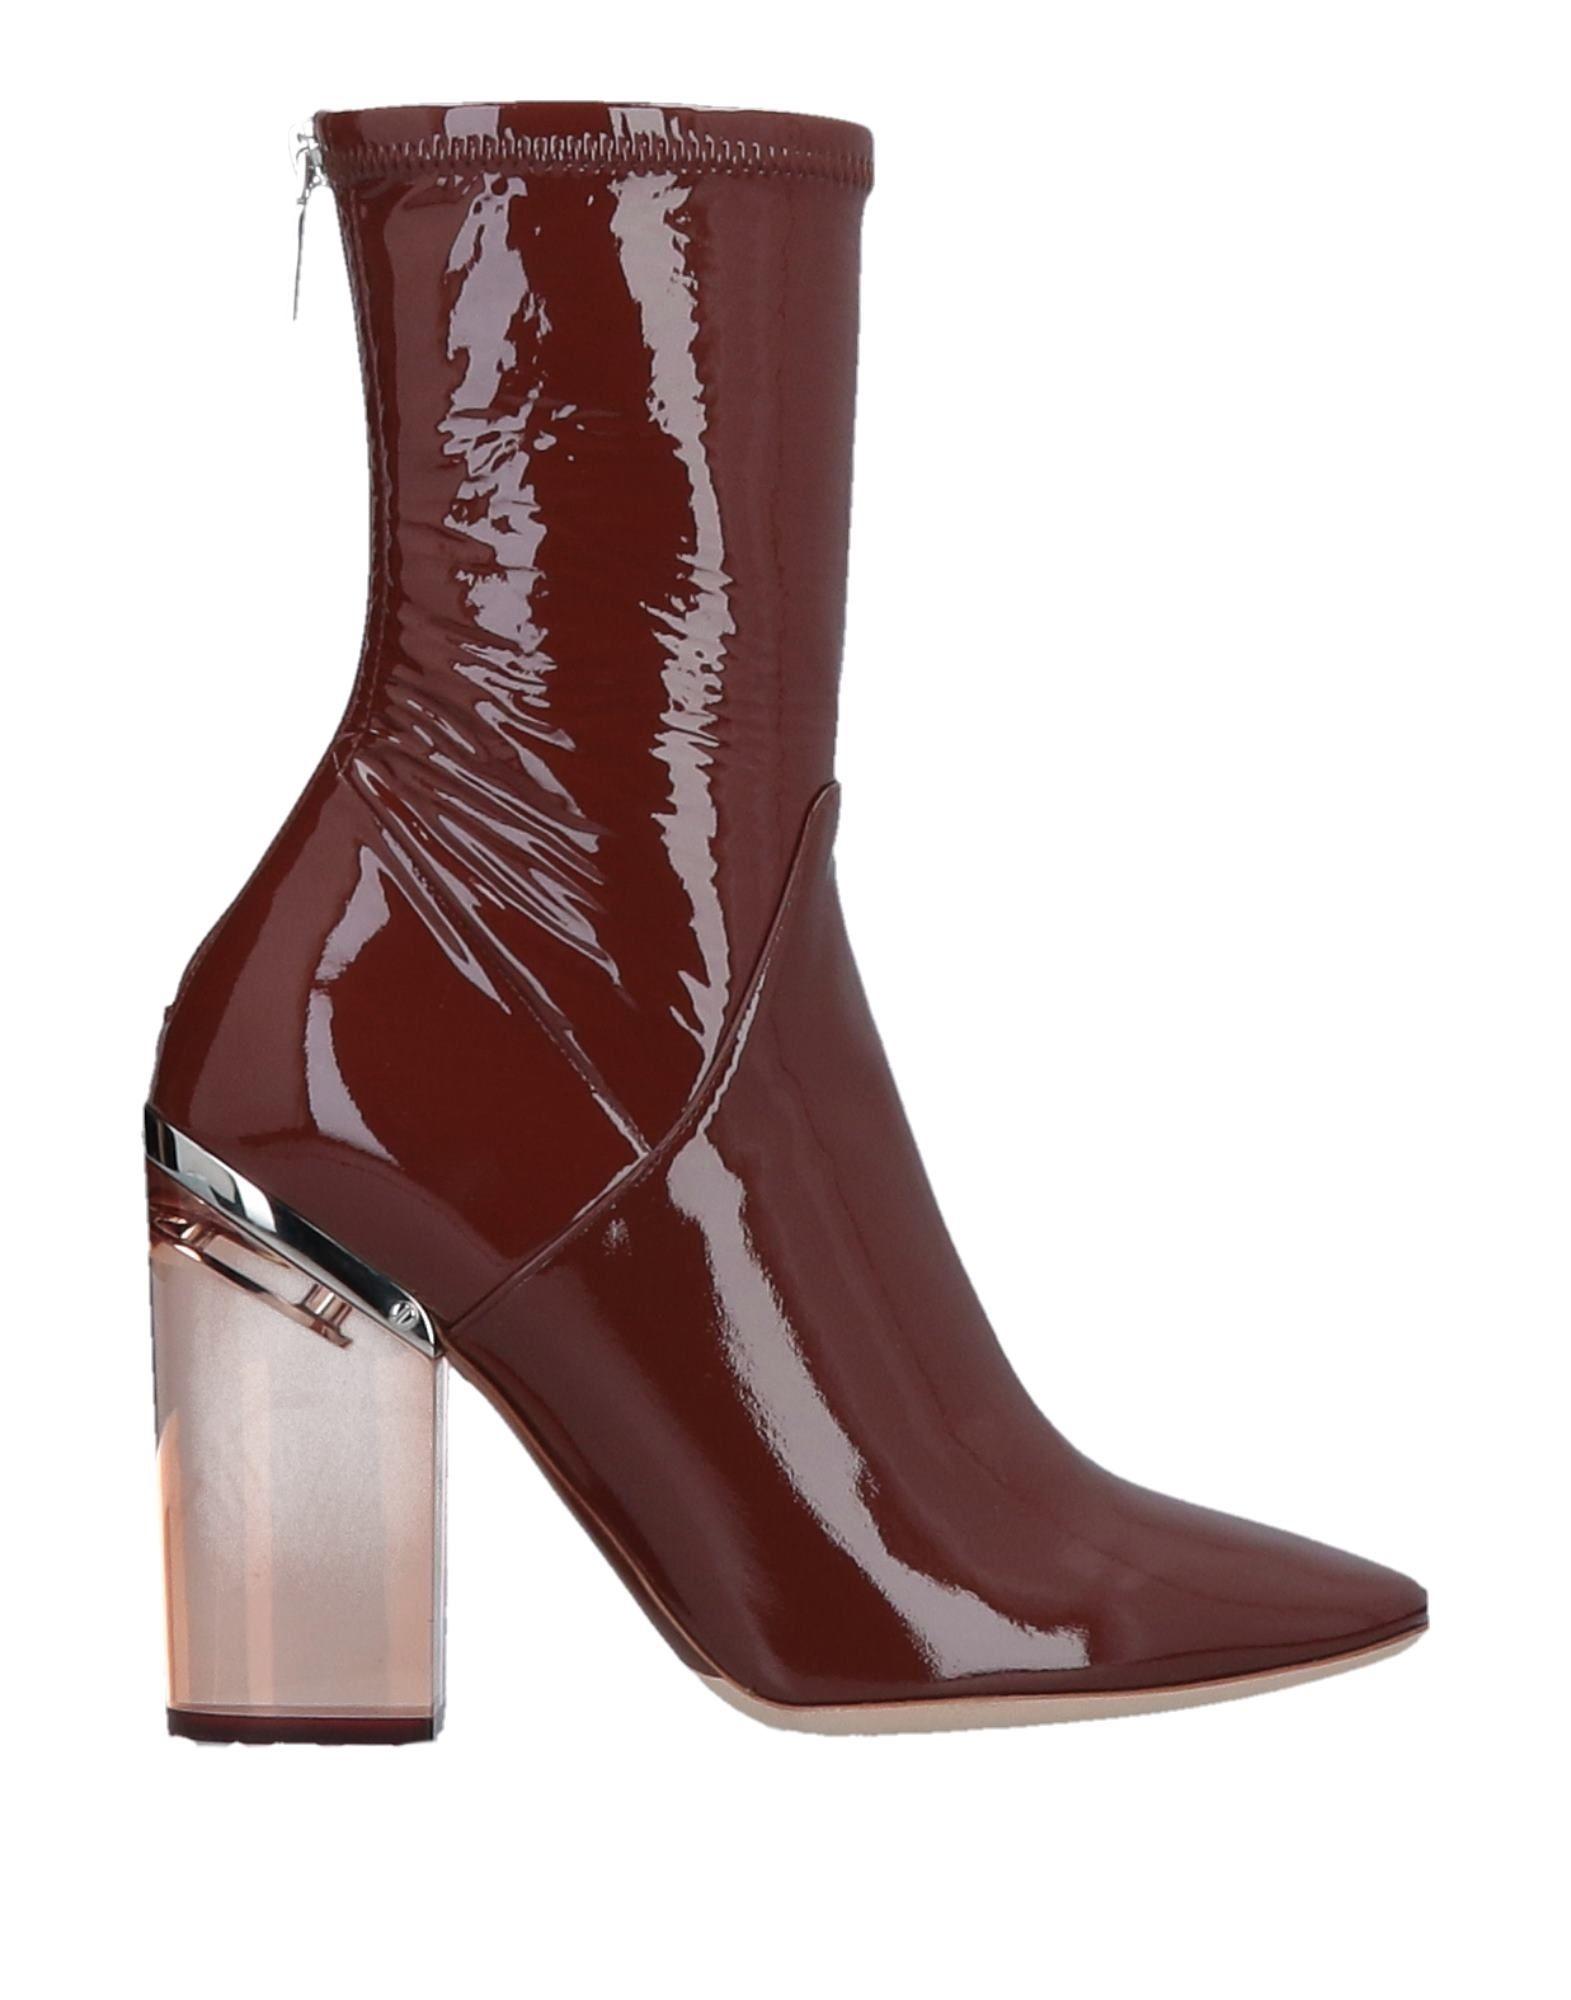 Moda Stivaletti Dior Donna - 11510701CG